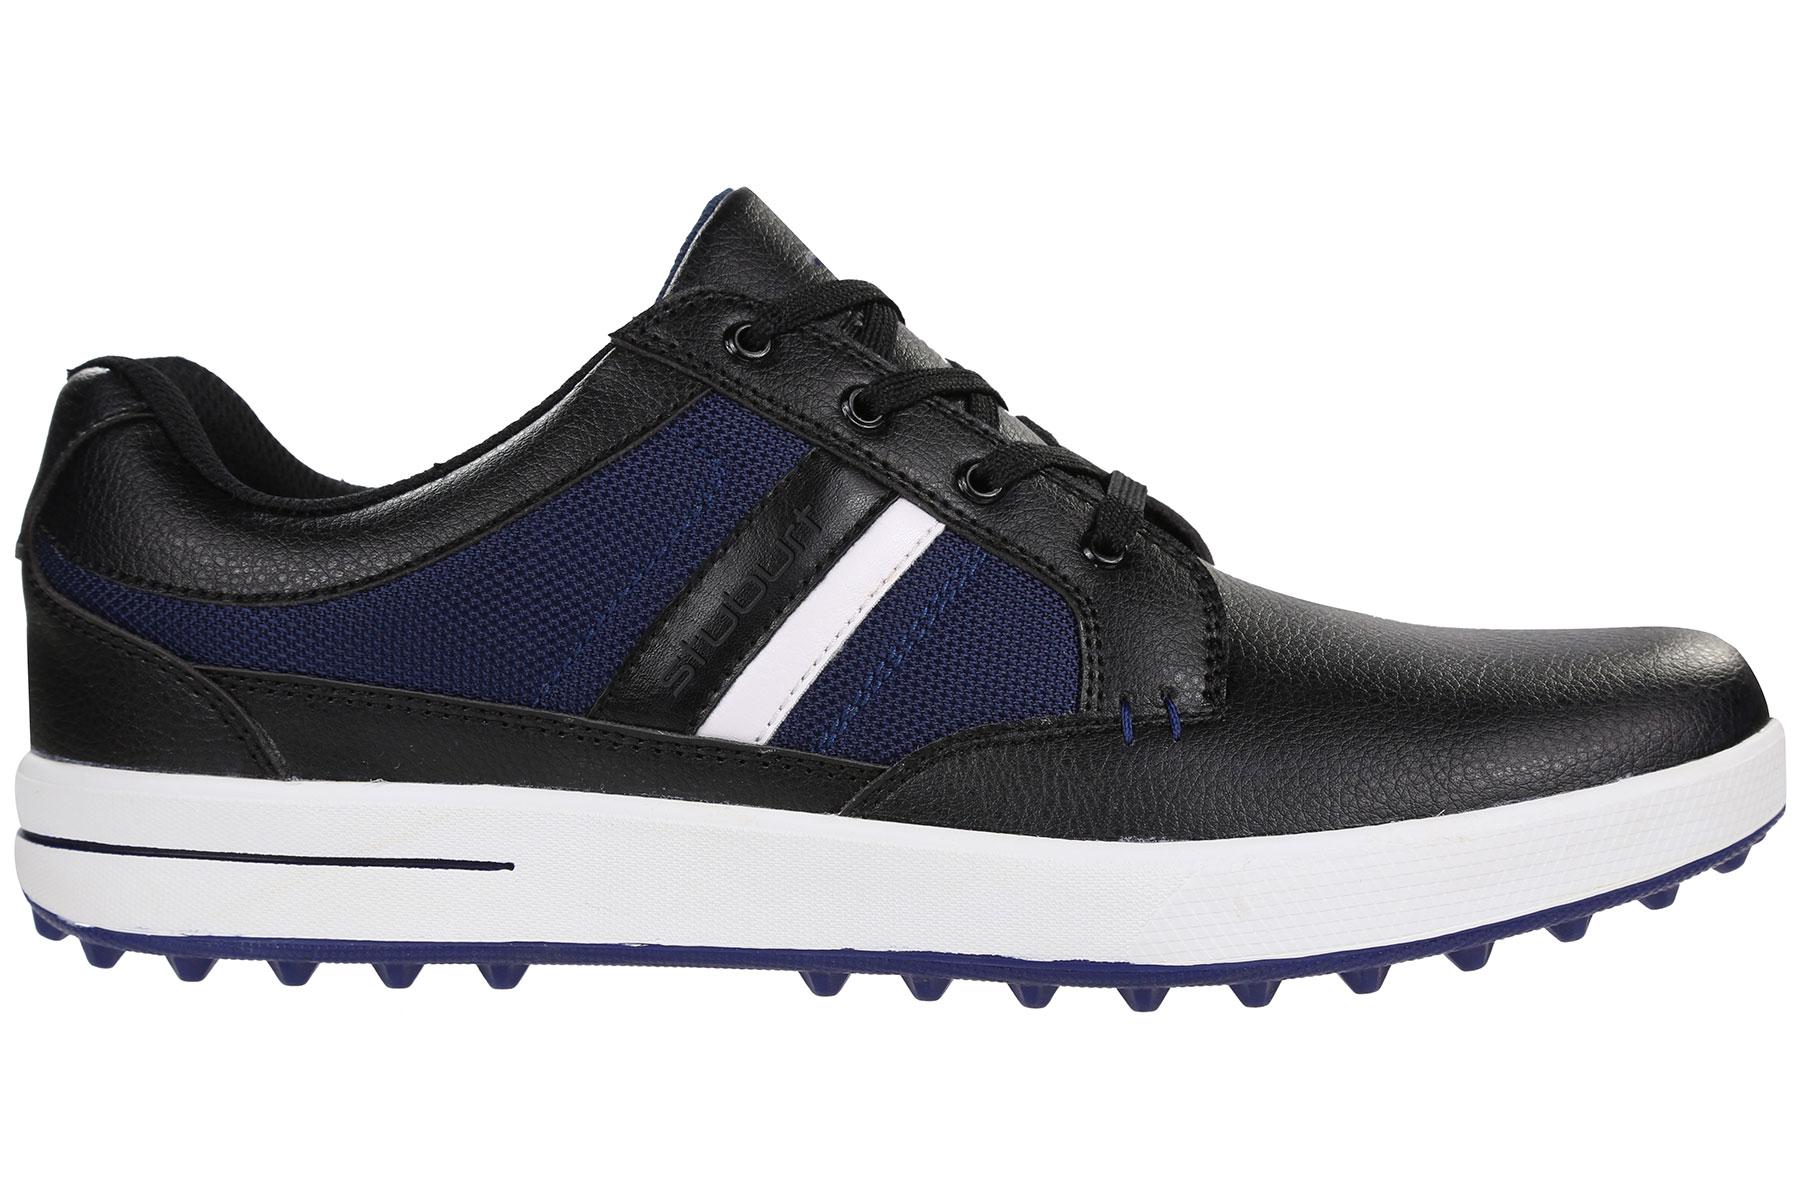 Stuburt Urban Fashion Shoes From American Golf